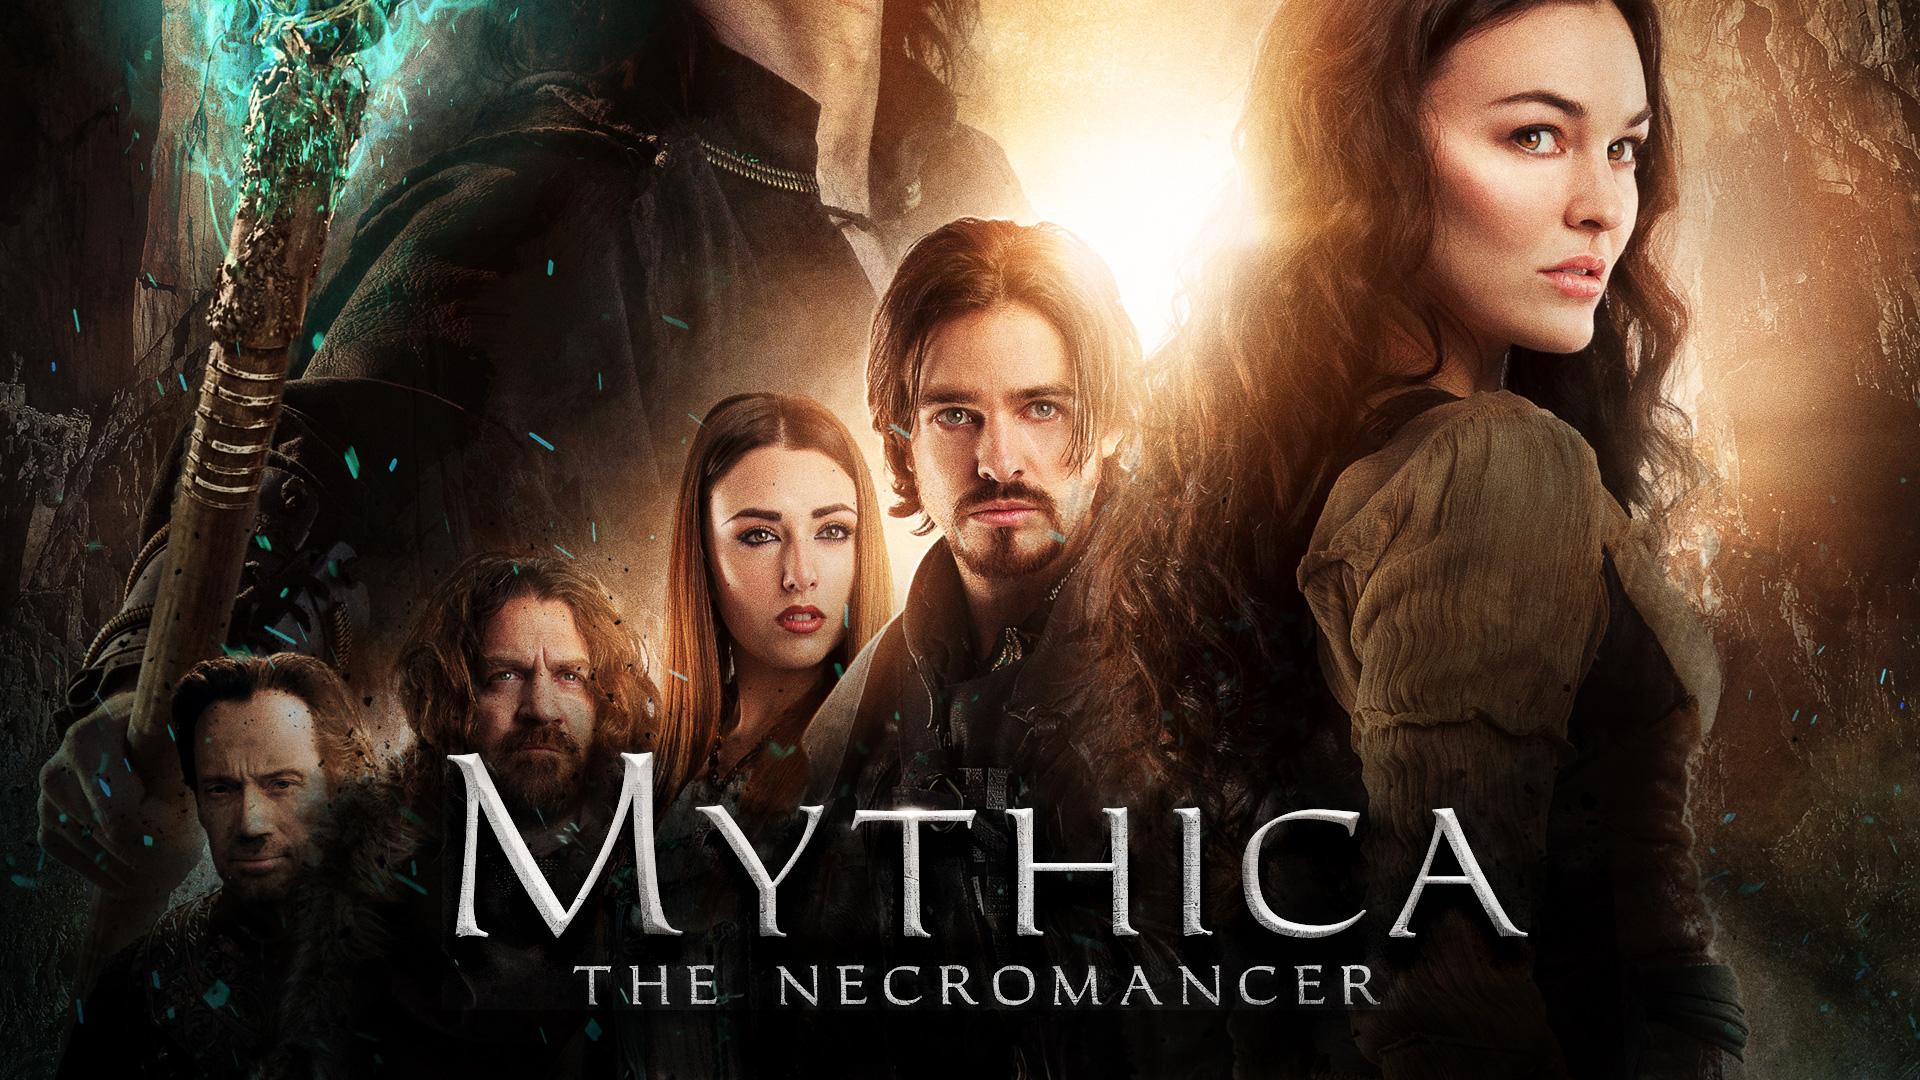 Mythica: The Necromancer on Amazon Prime Video UK